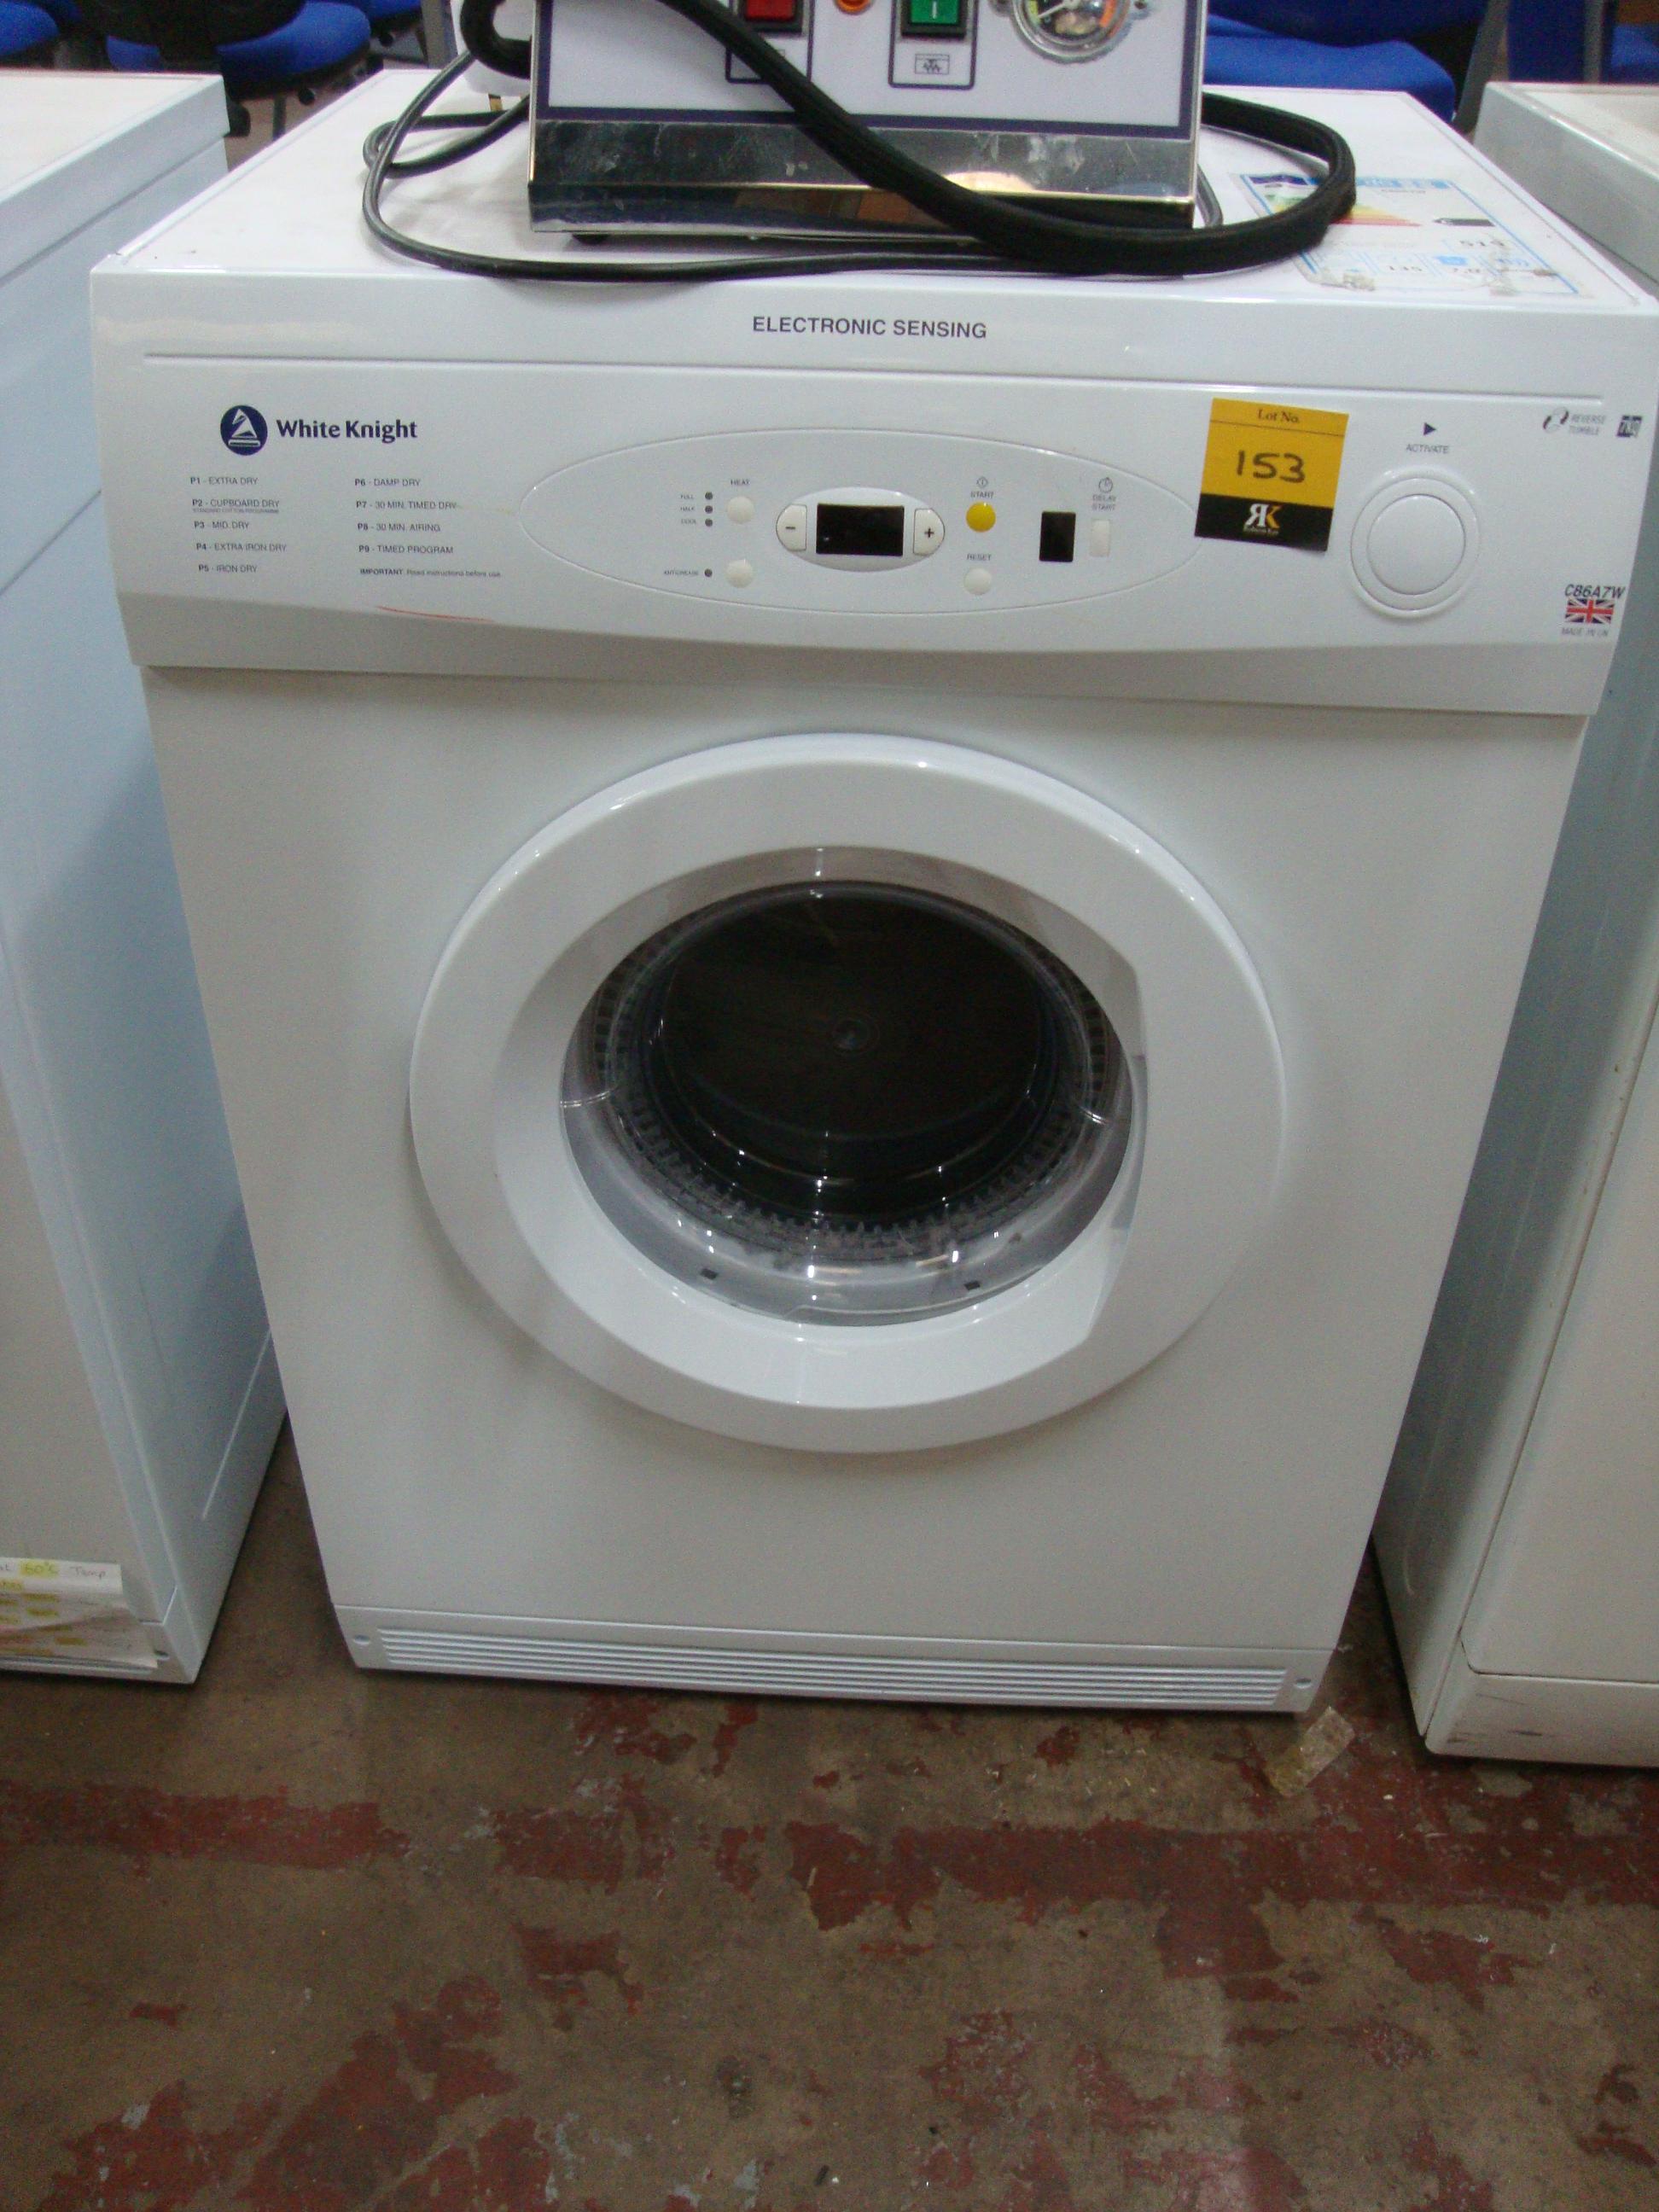 Tumble Dryers Espanol ~ White knight electronic sensing kg tumble dryer model